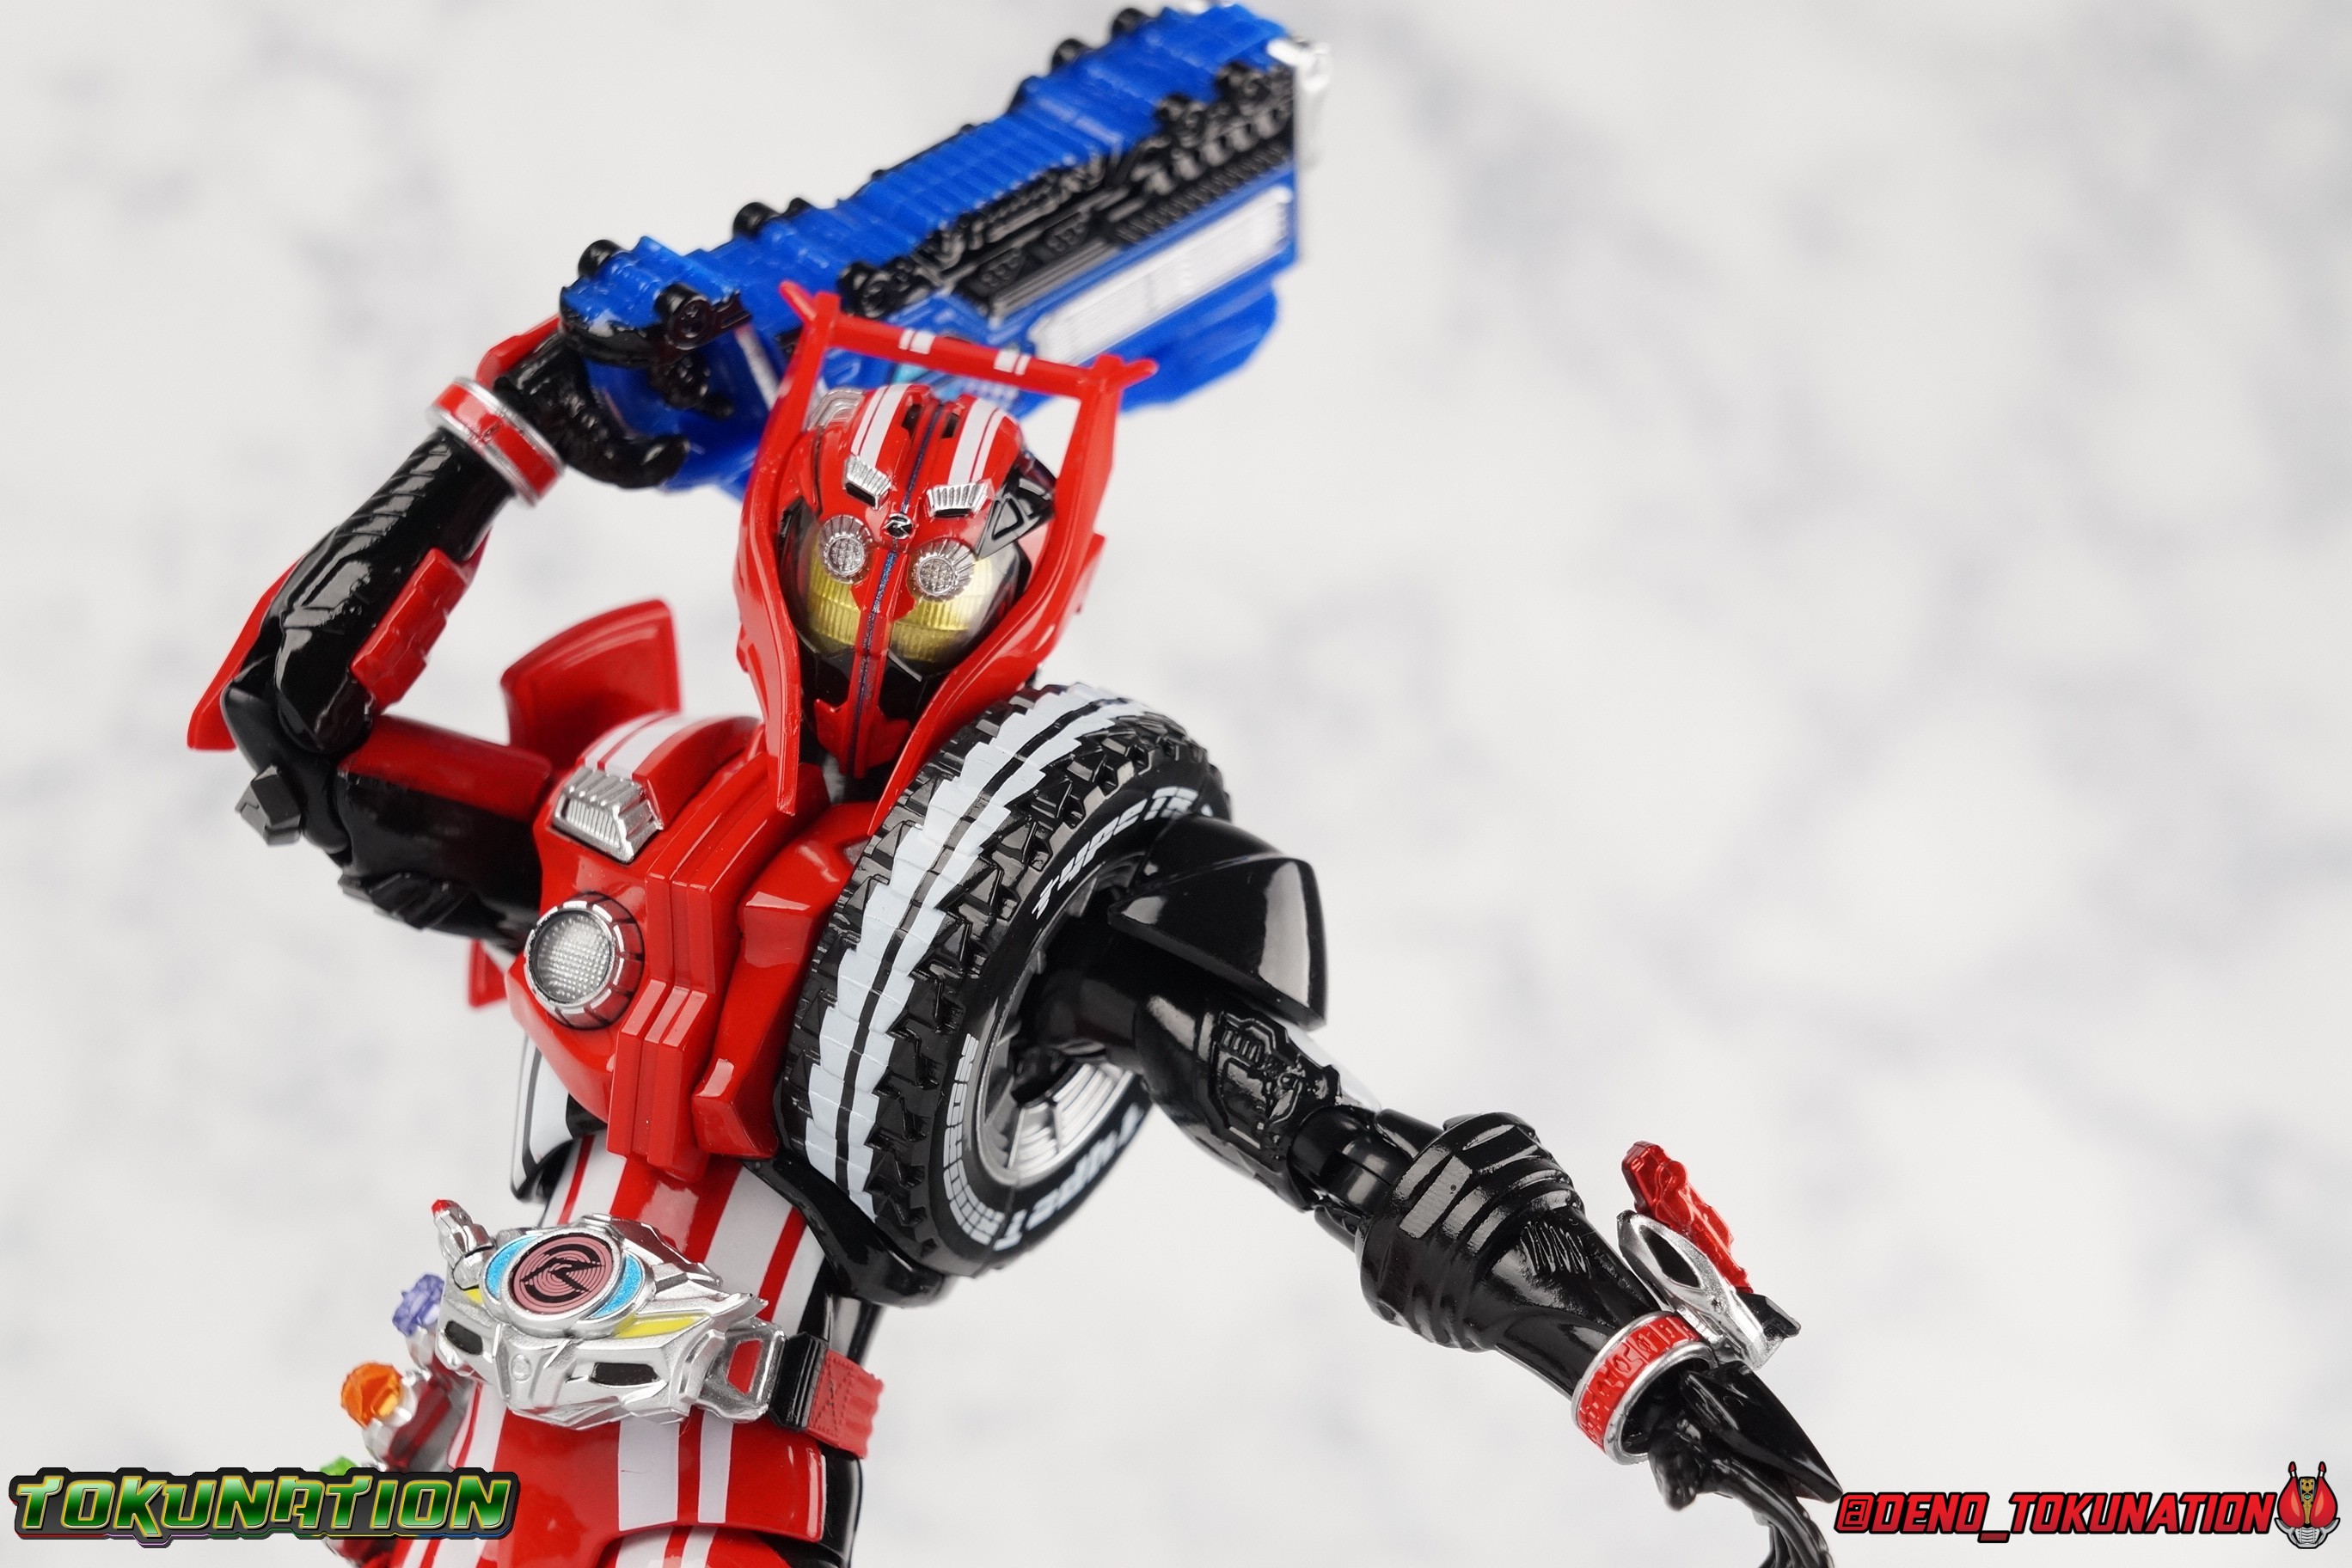 S H  Figuarts Kamen Rider Drive Type Tridoron & Tire